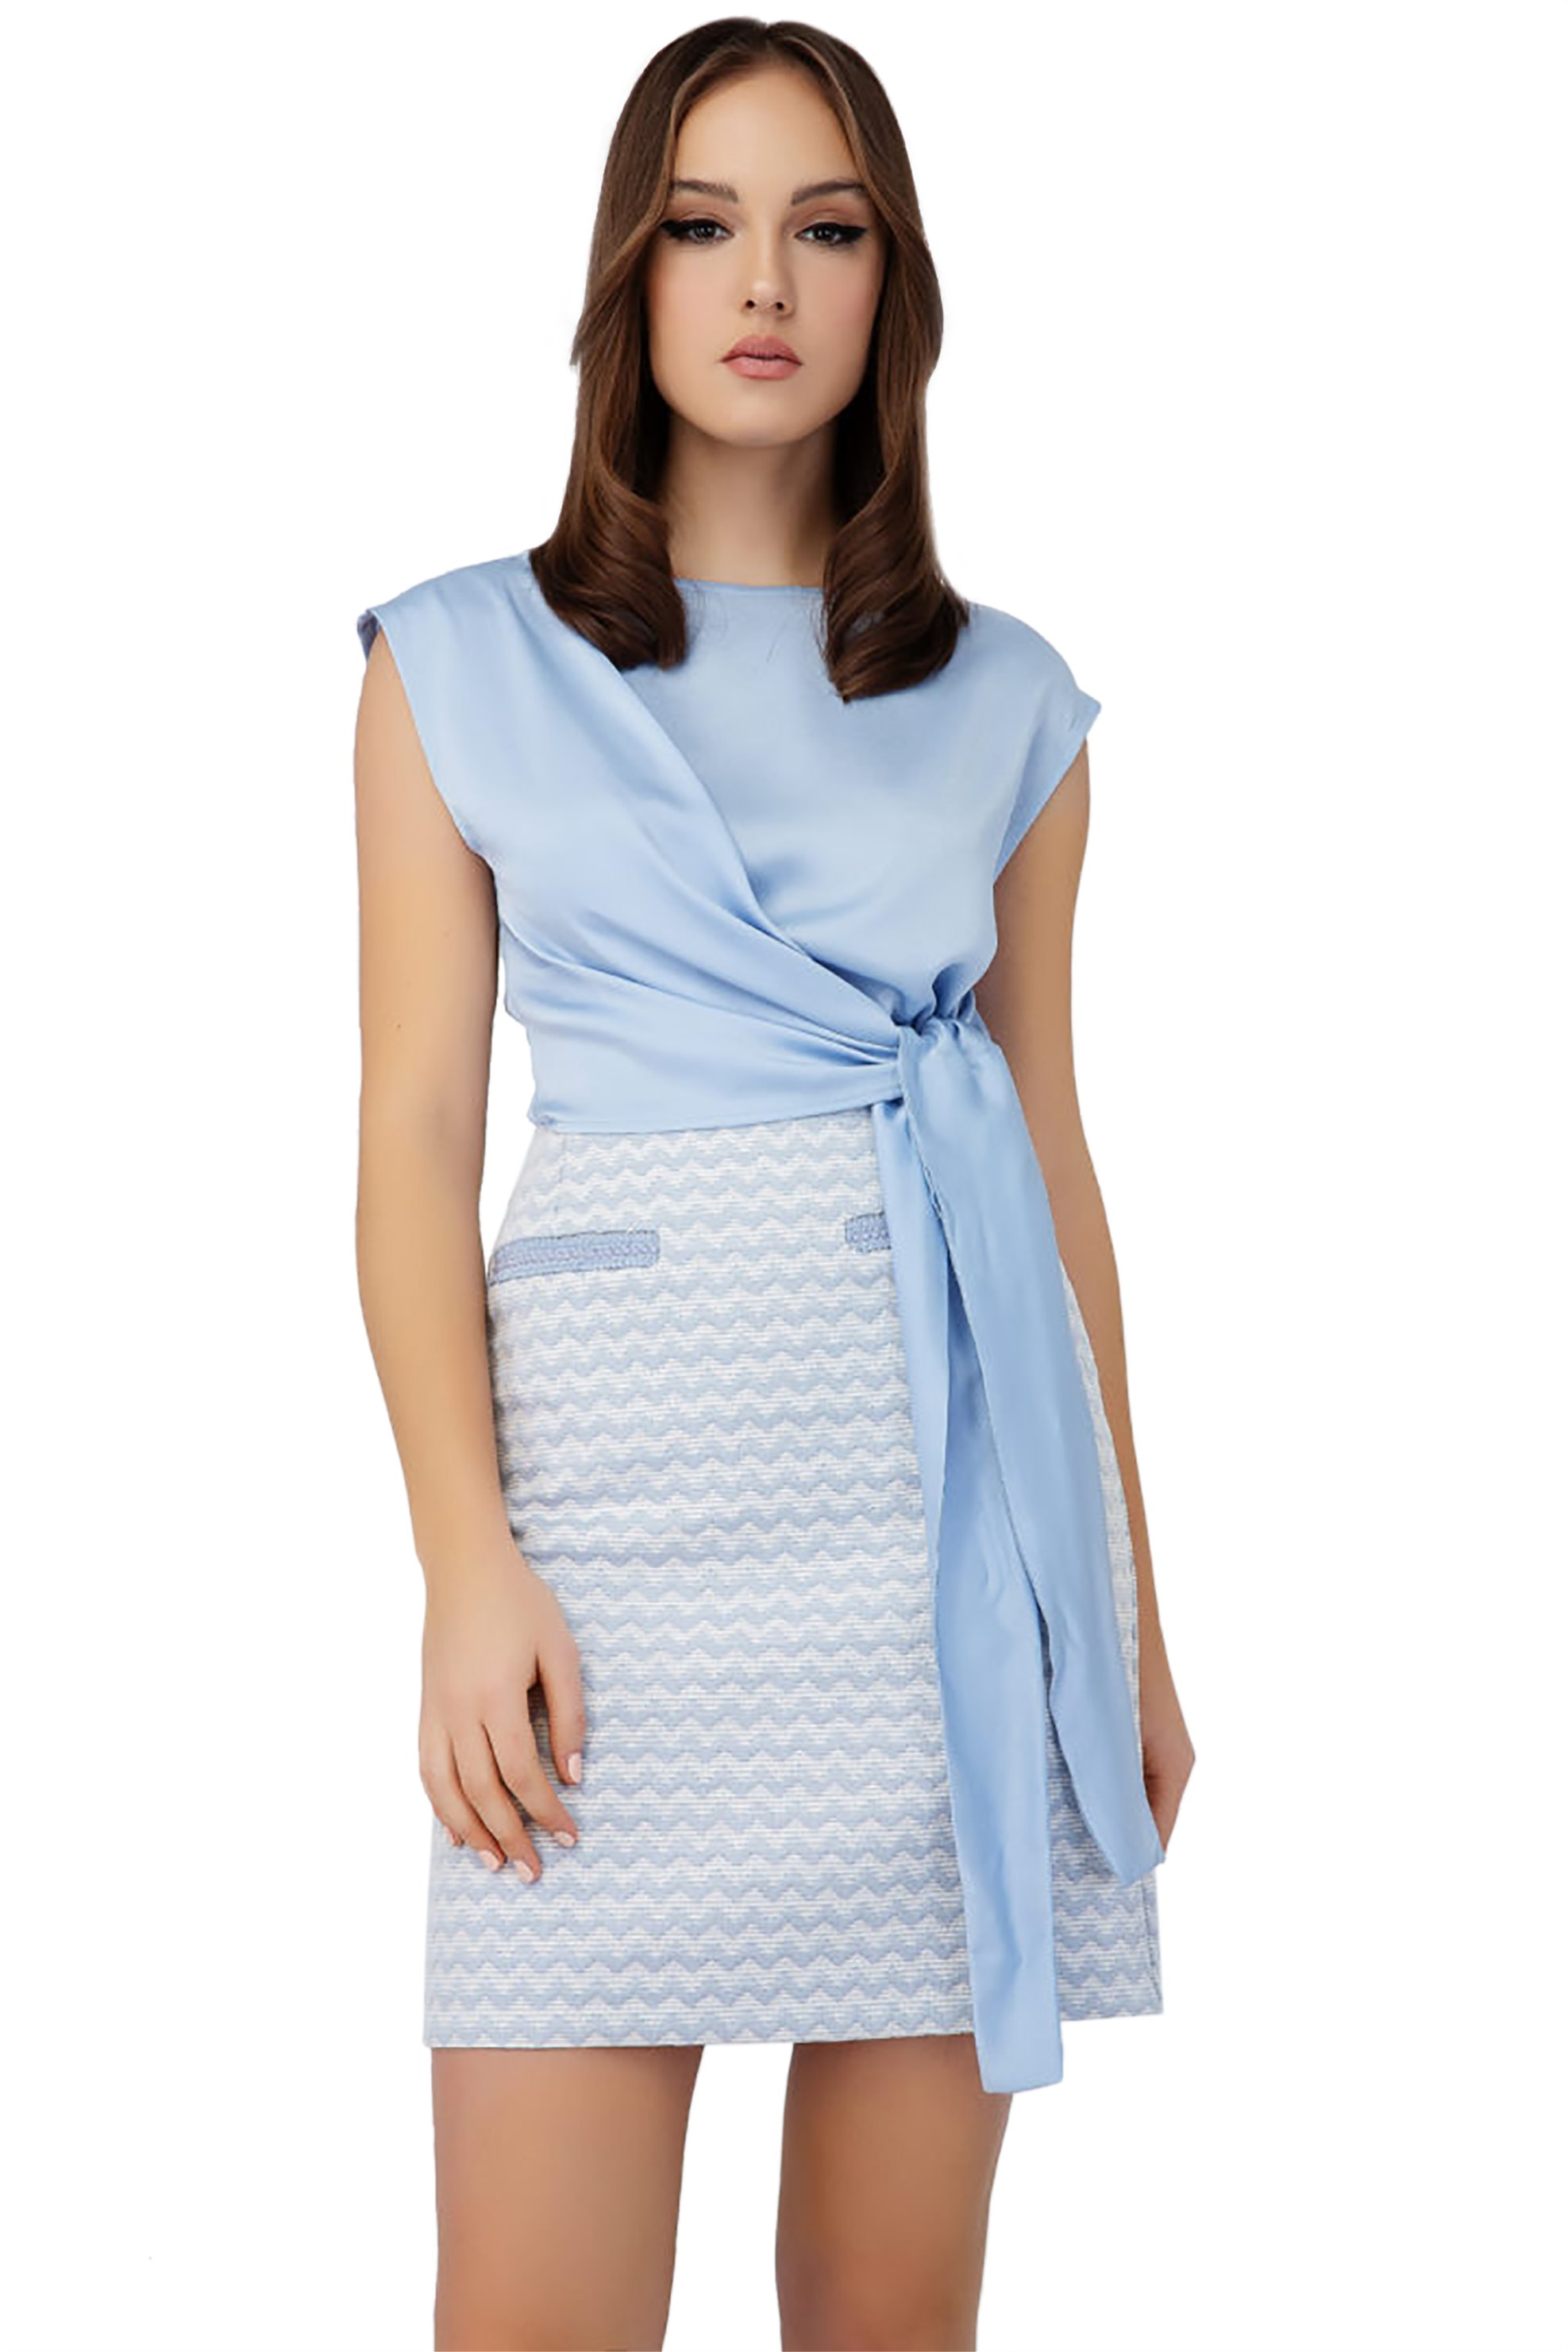 Billy Sabbado γυναικεία μπλούζα με δέσιμο - 0239217290 - Γαλάζιο γυναικα   ρουχα   tops   μπλούζες   βραδυνές